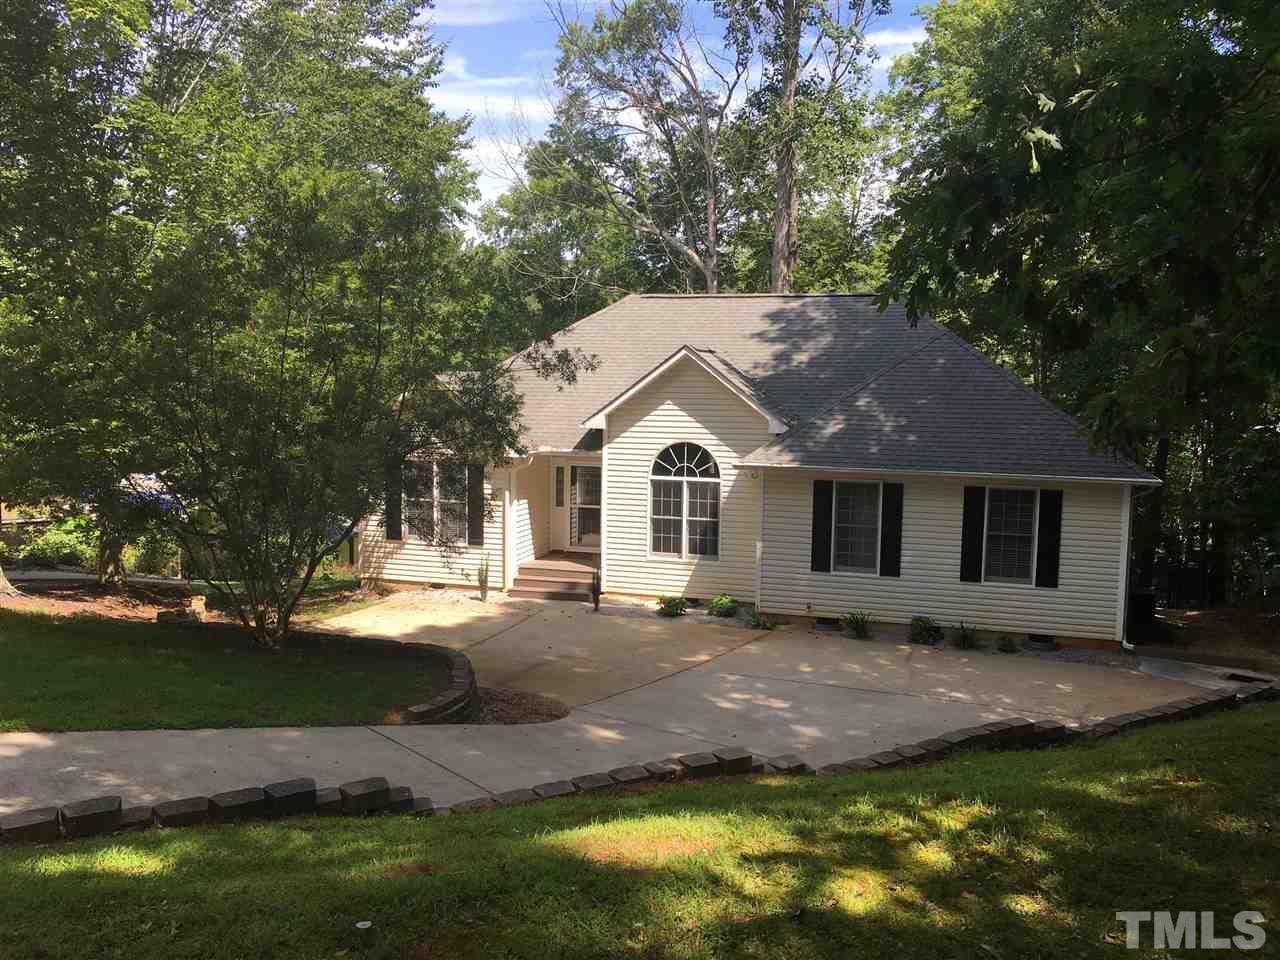 Homes For Sale On Sagamore Drive Louisburg Nc